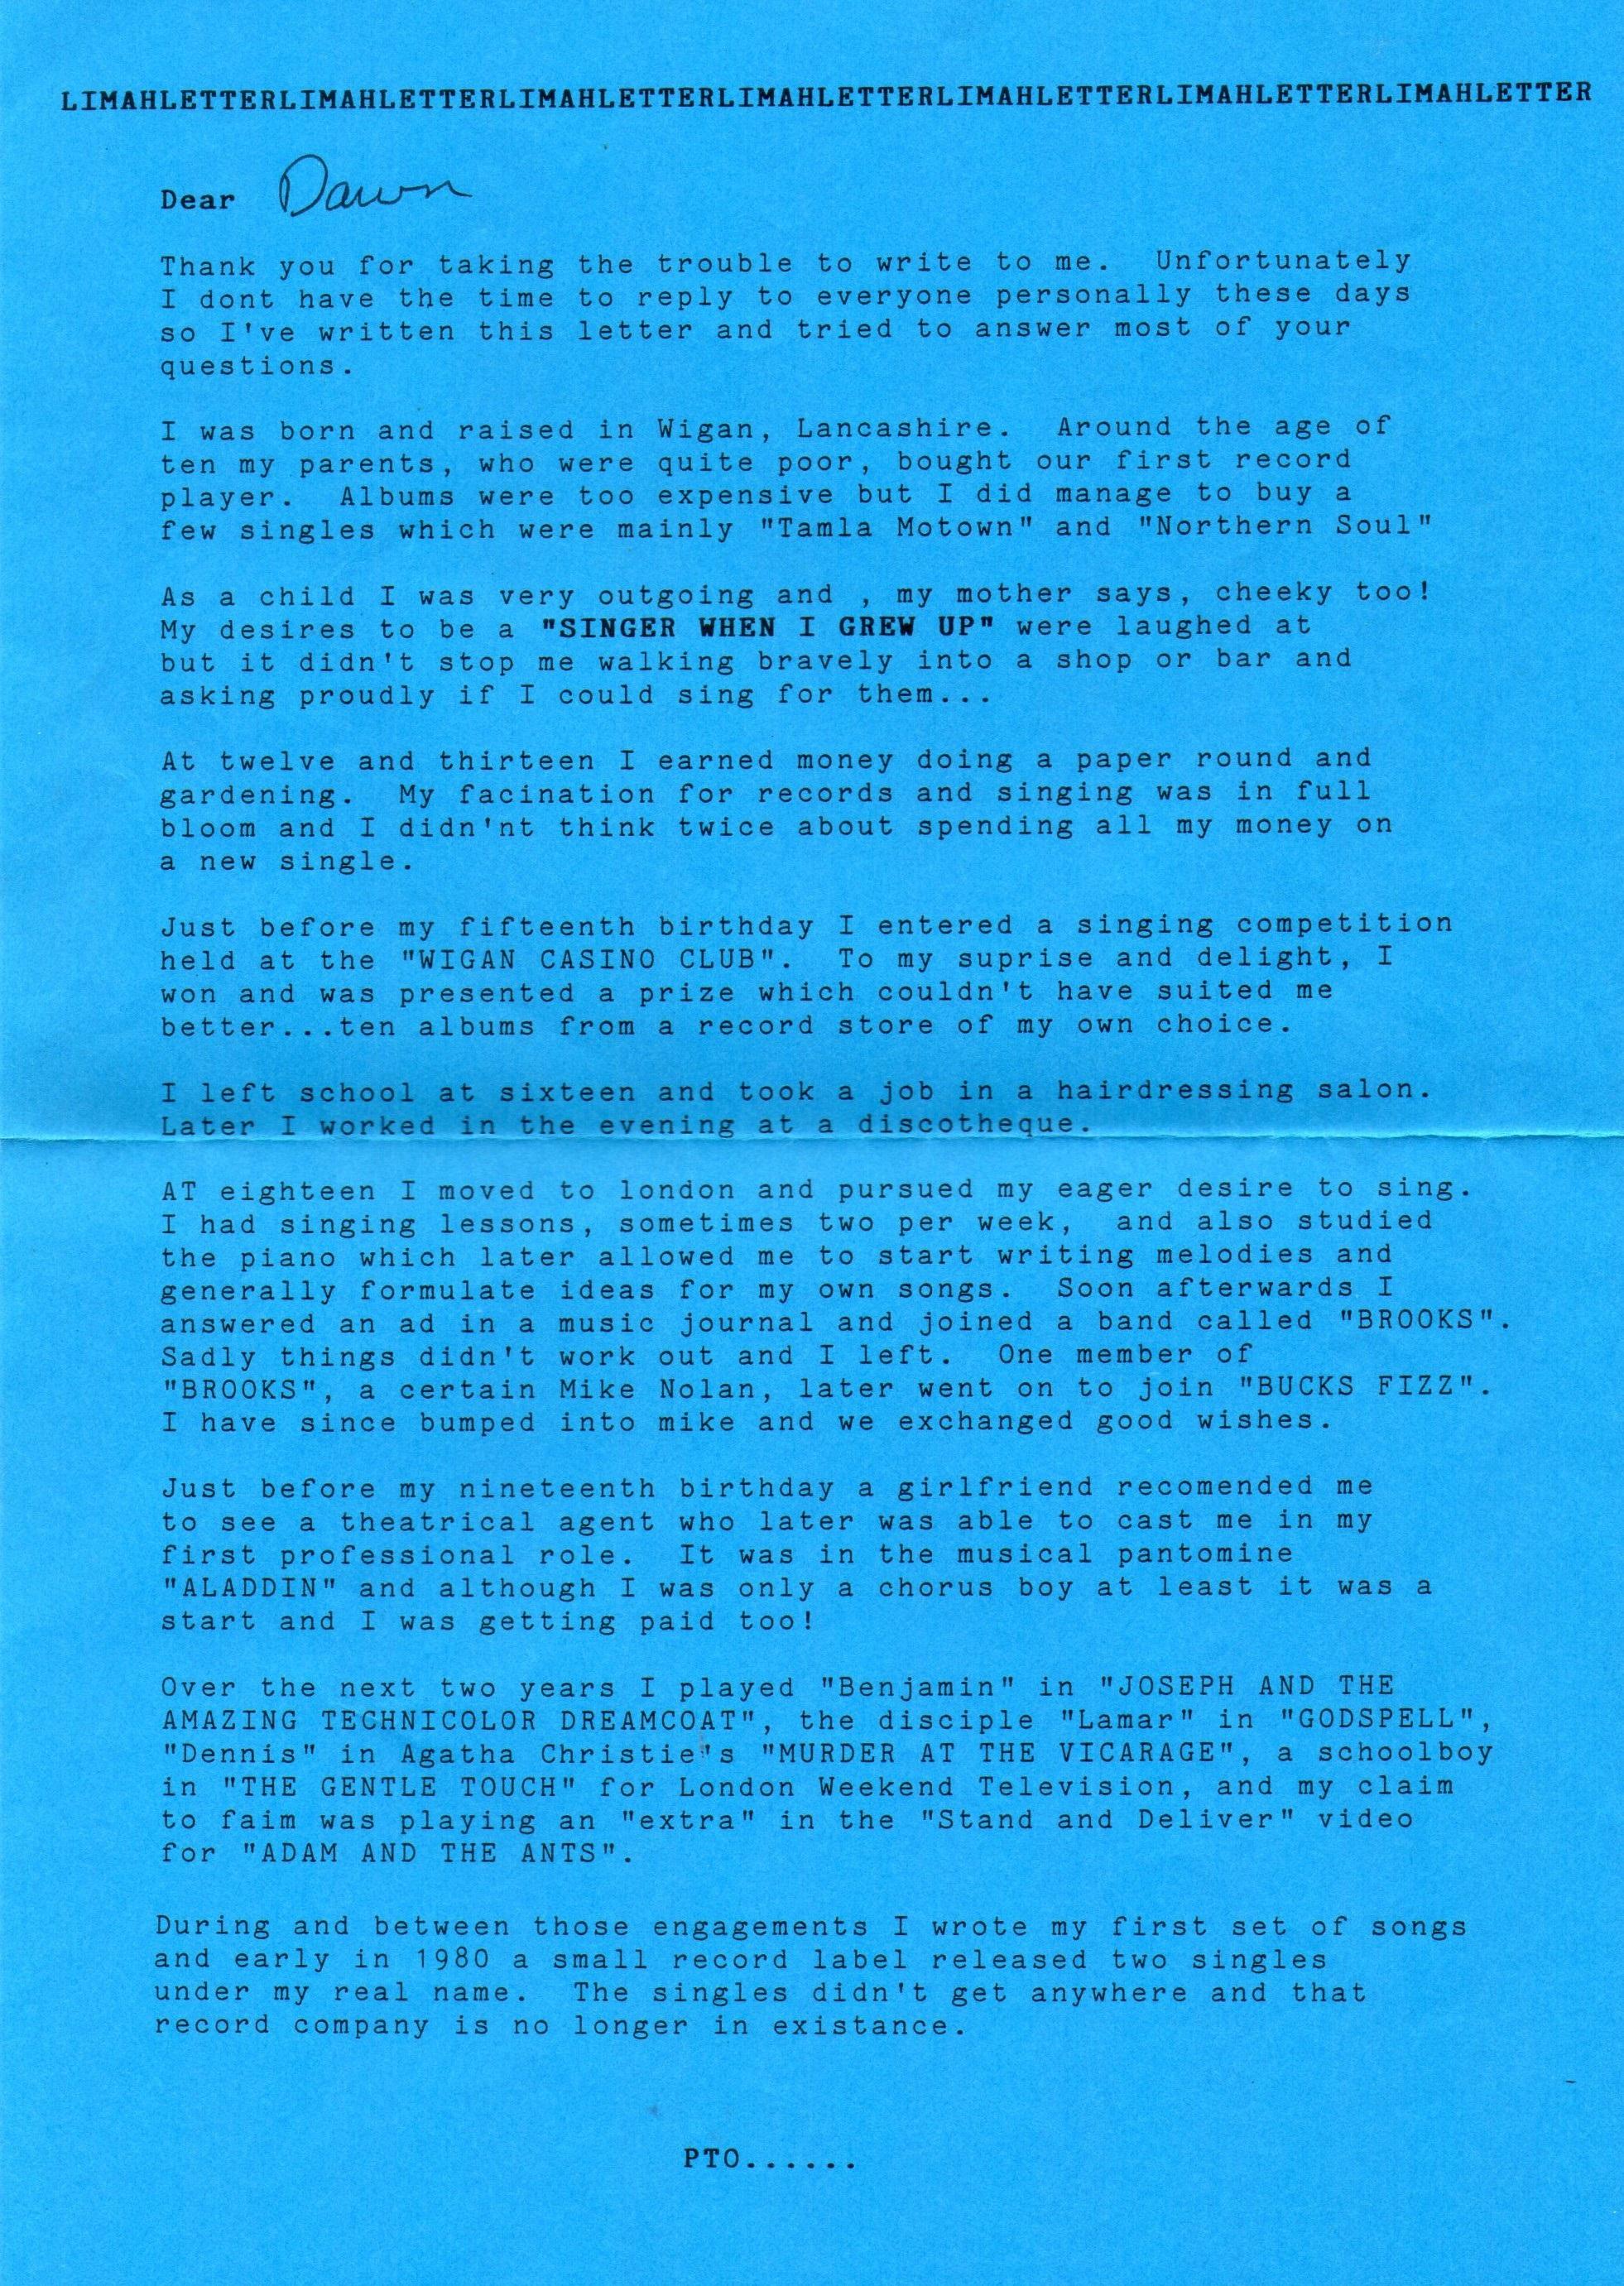 03 limahl letter front